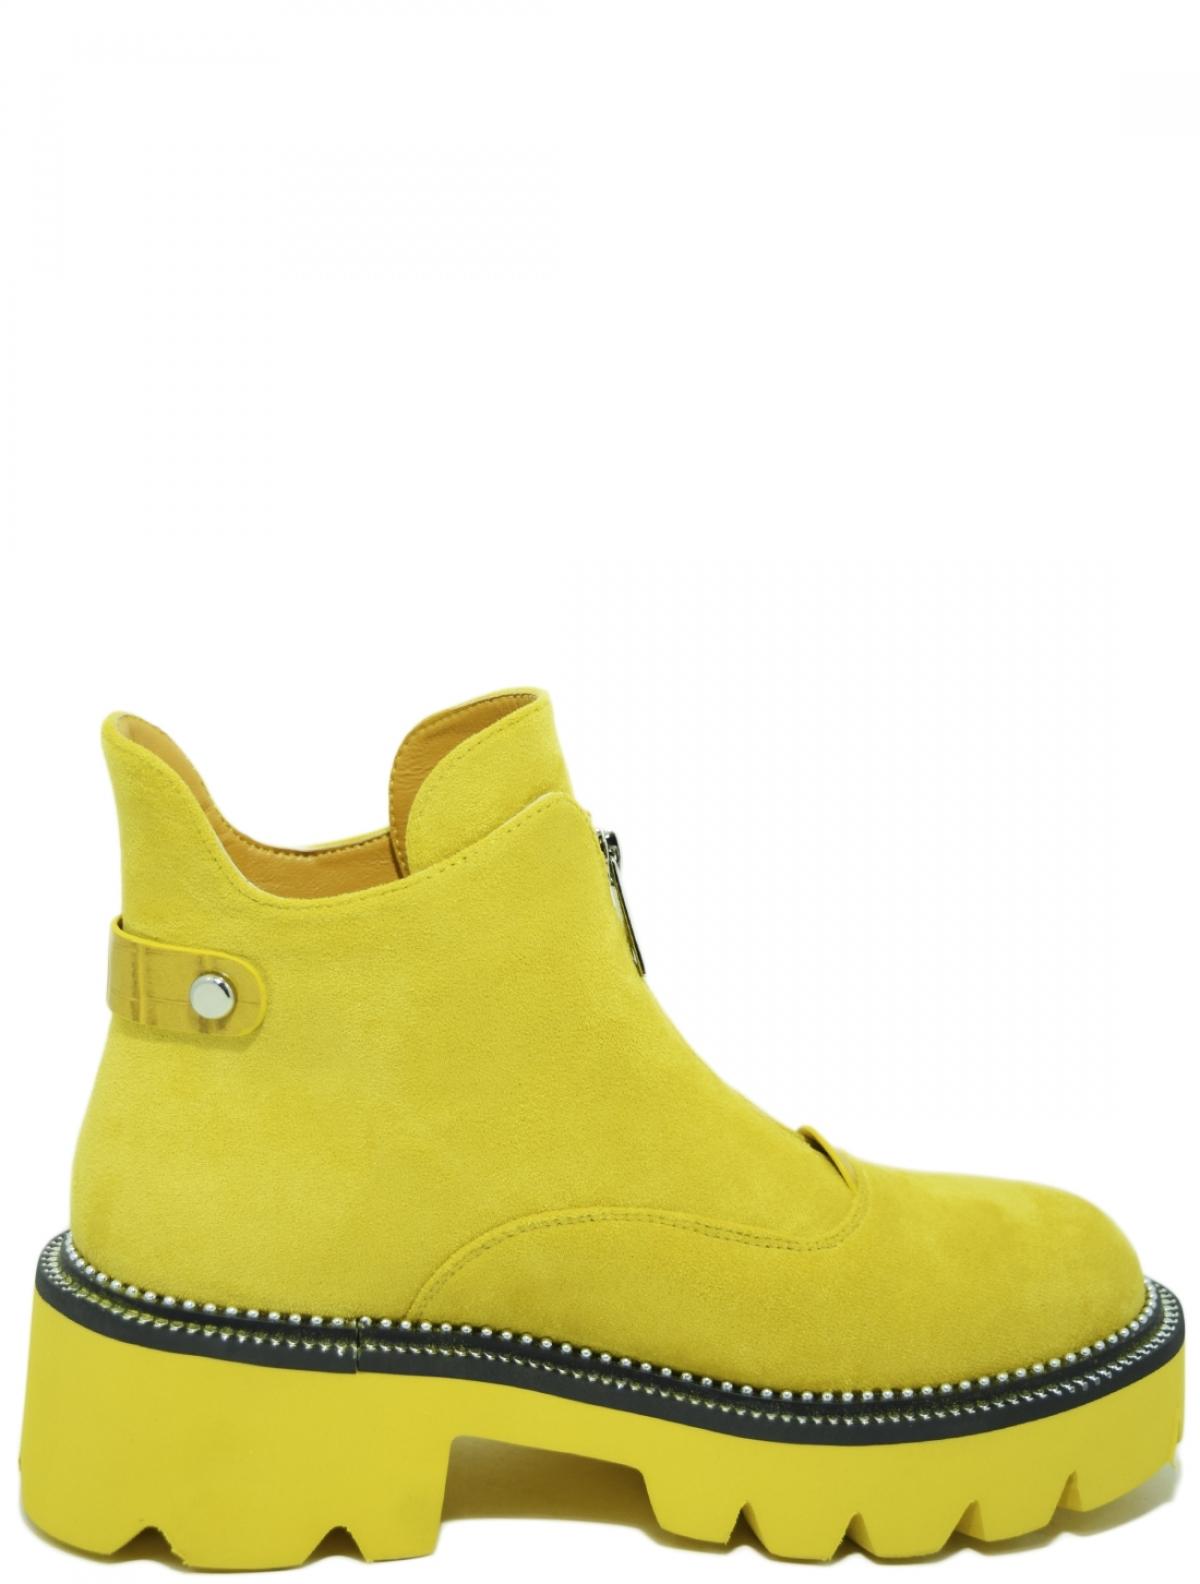 АРАЗ LX134 женские ботинки